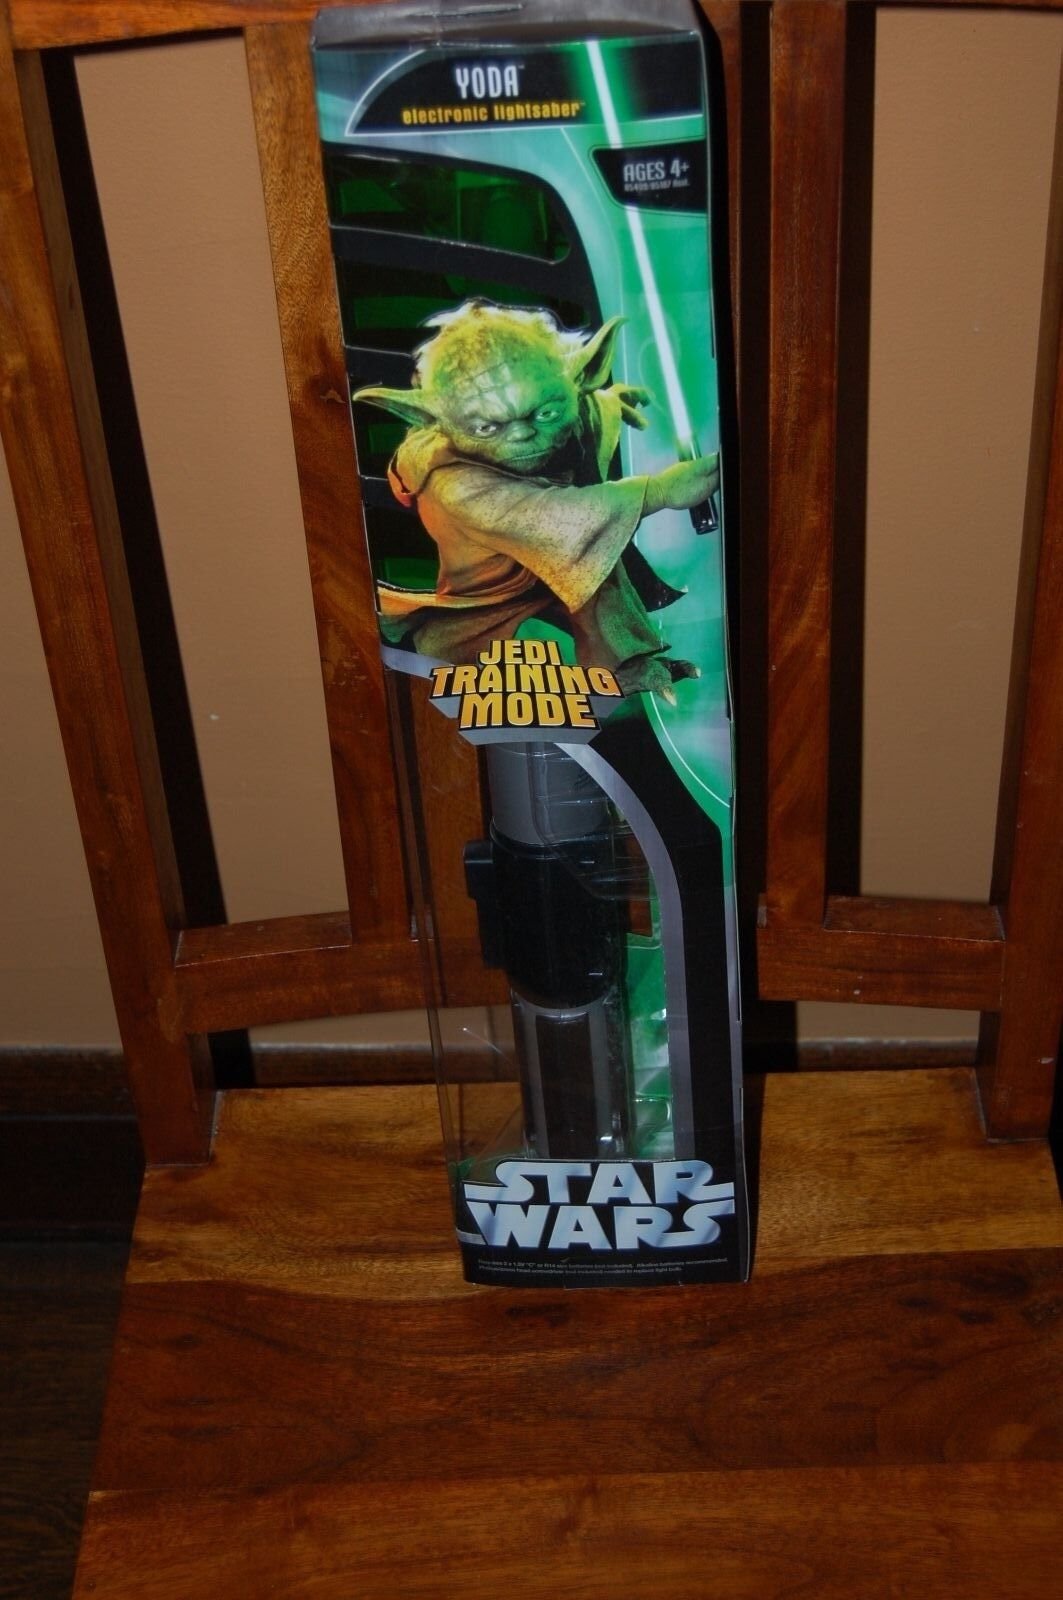 Modo de entrenamiento Yoda Jedi Lightsaber Electronic-Estrella Wars Hasbro 2005